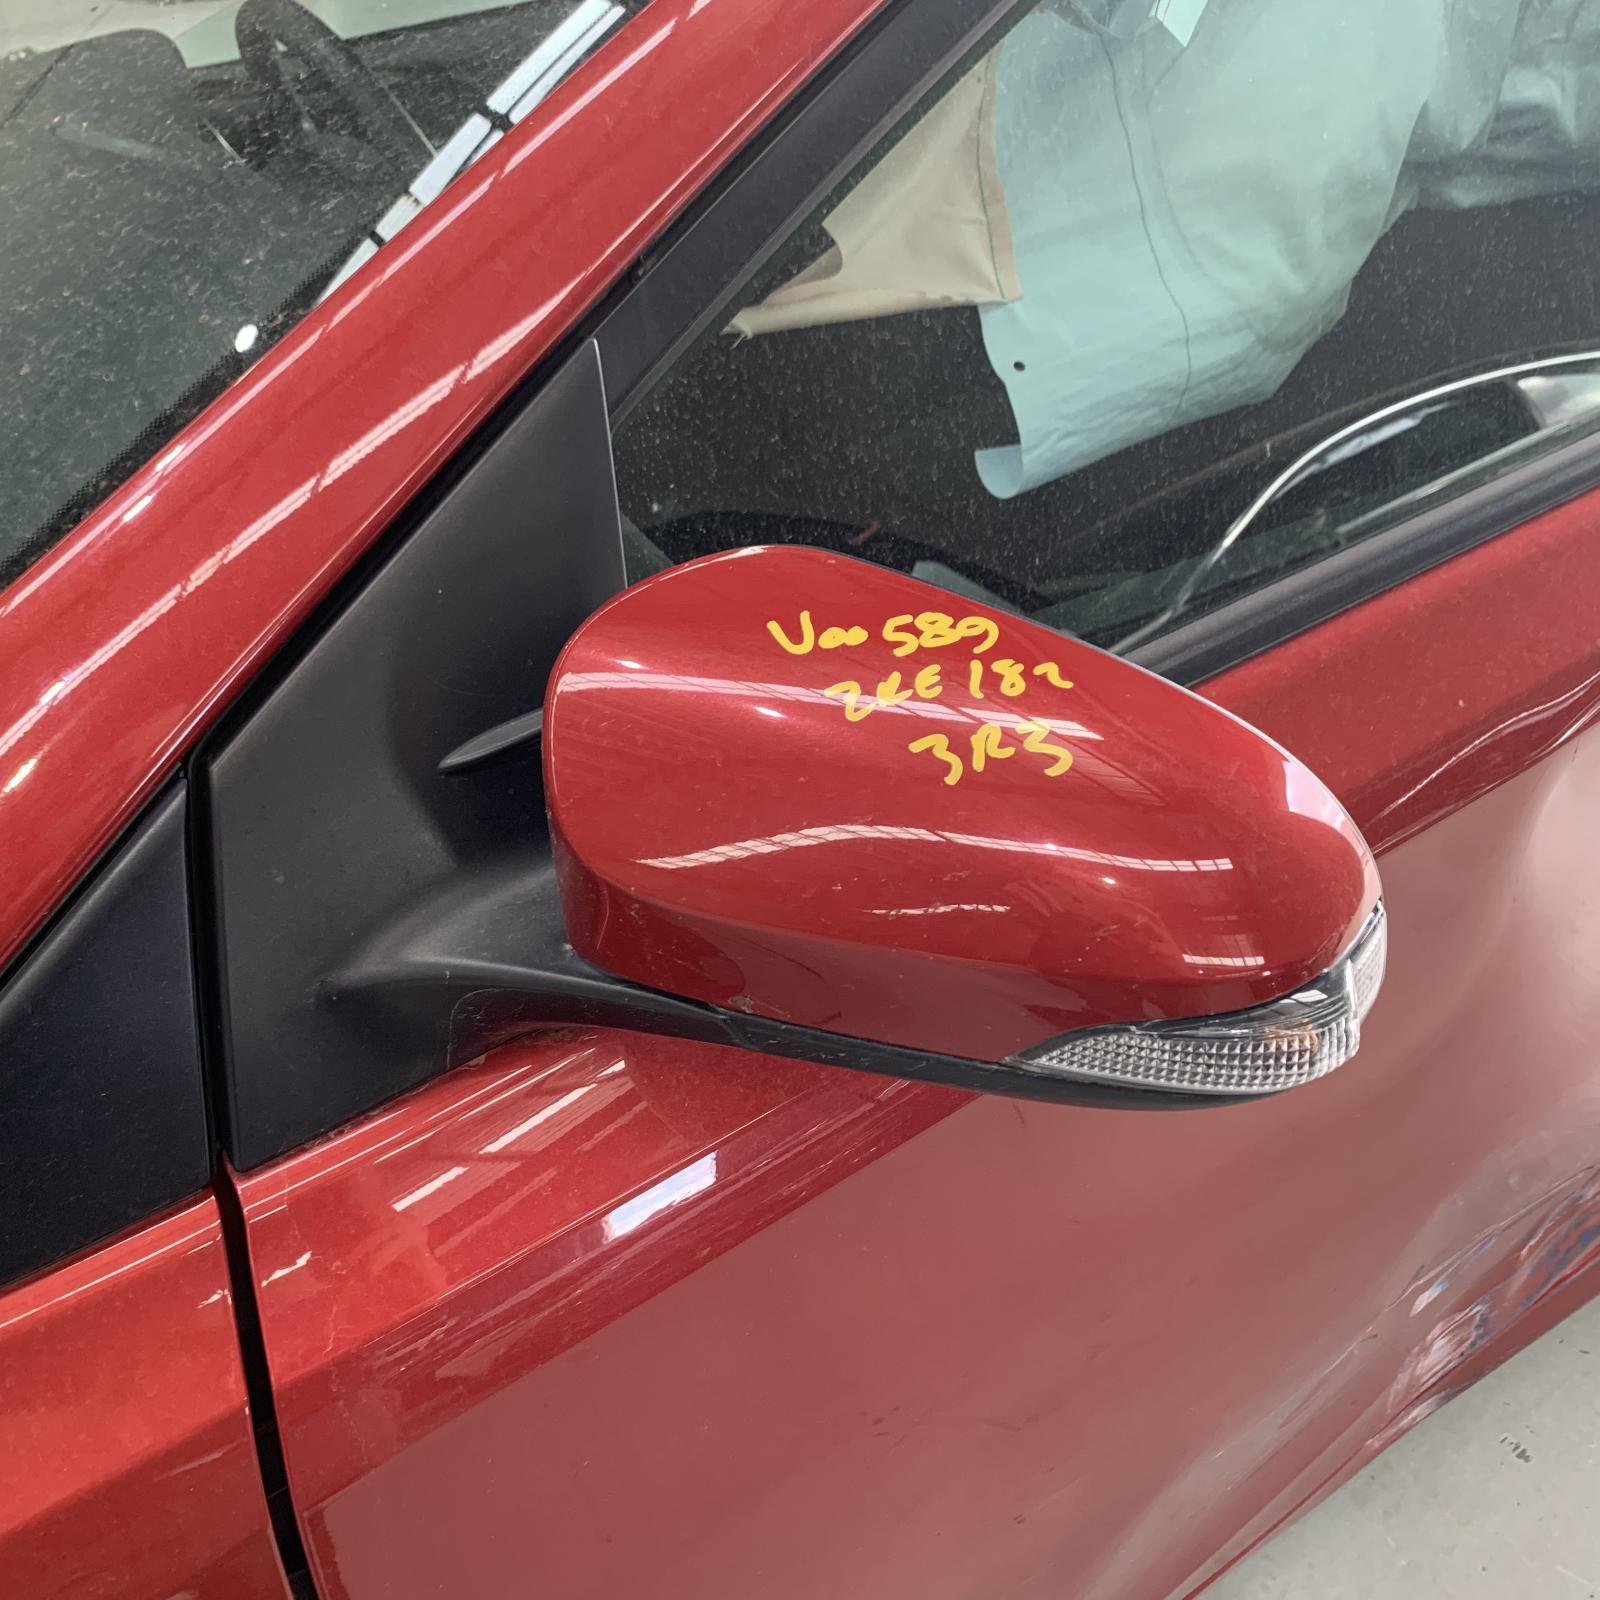 TOYOTA COROLLA, Left Door Mirror, ZRE182R/ZWE186R, HATCH, MANUAL FOLDING TYPE, 10/12-